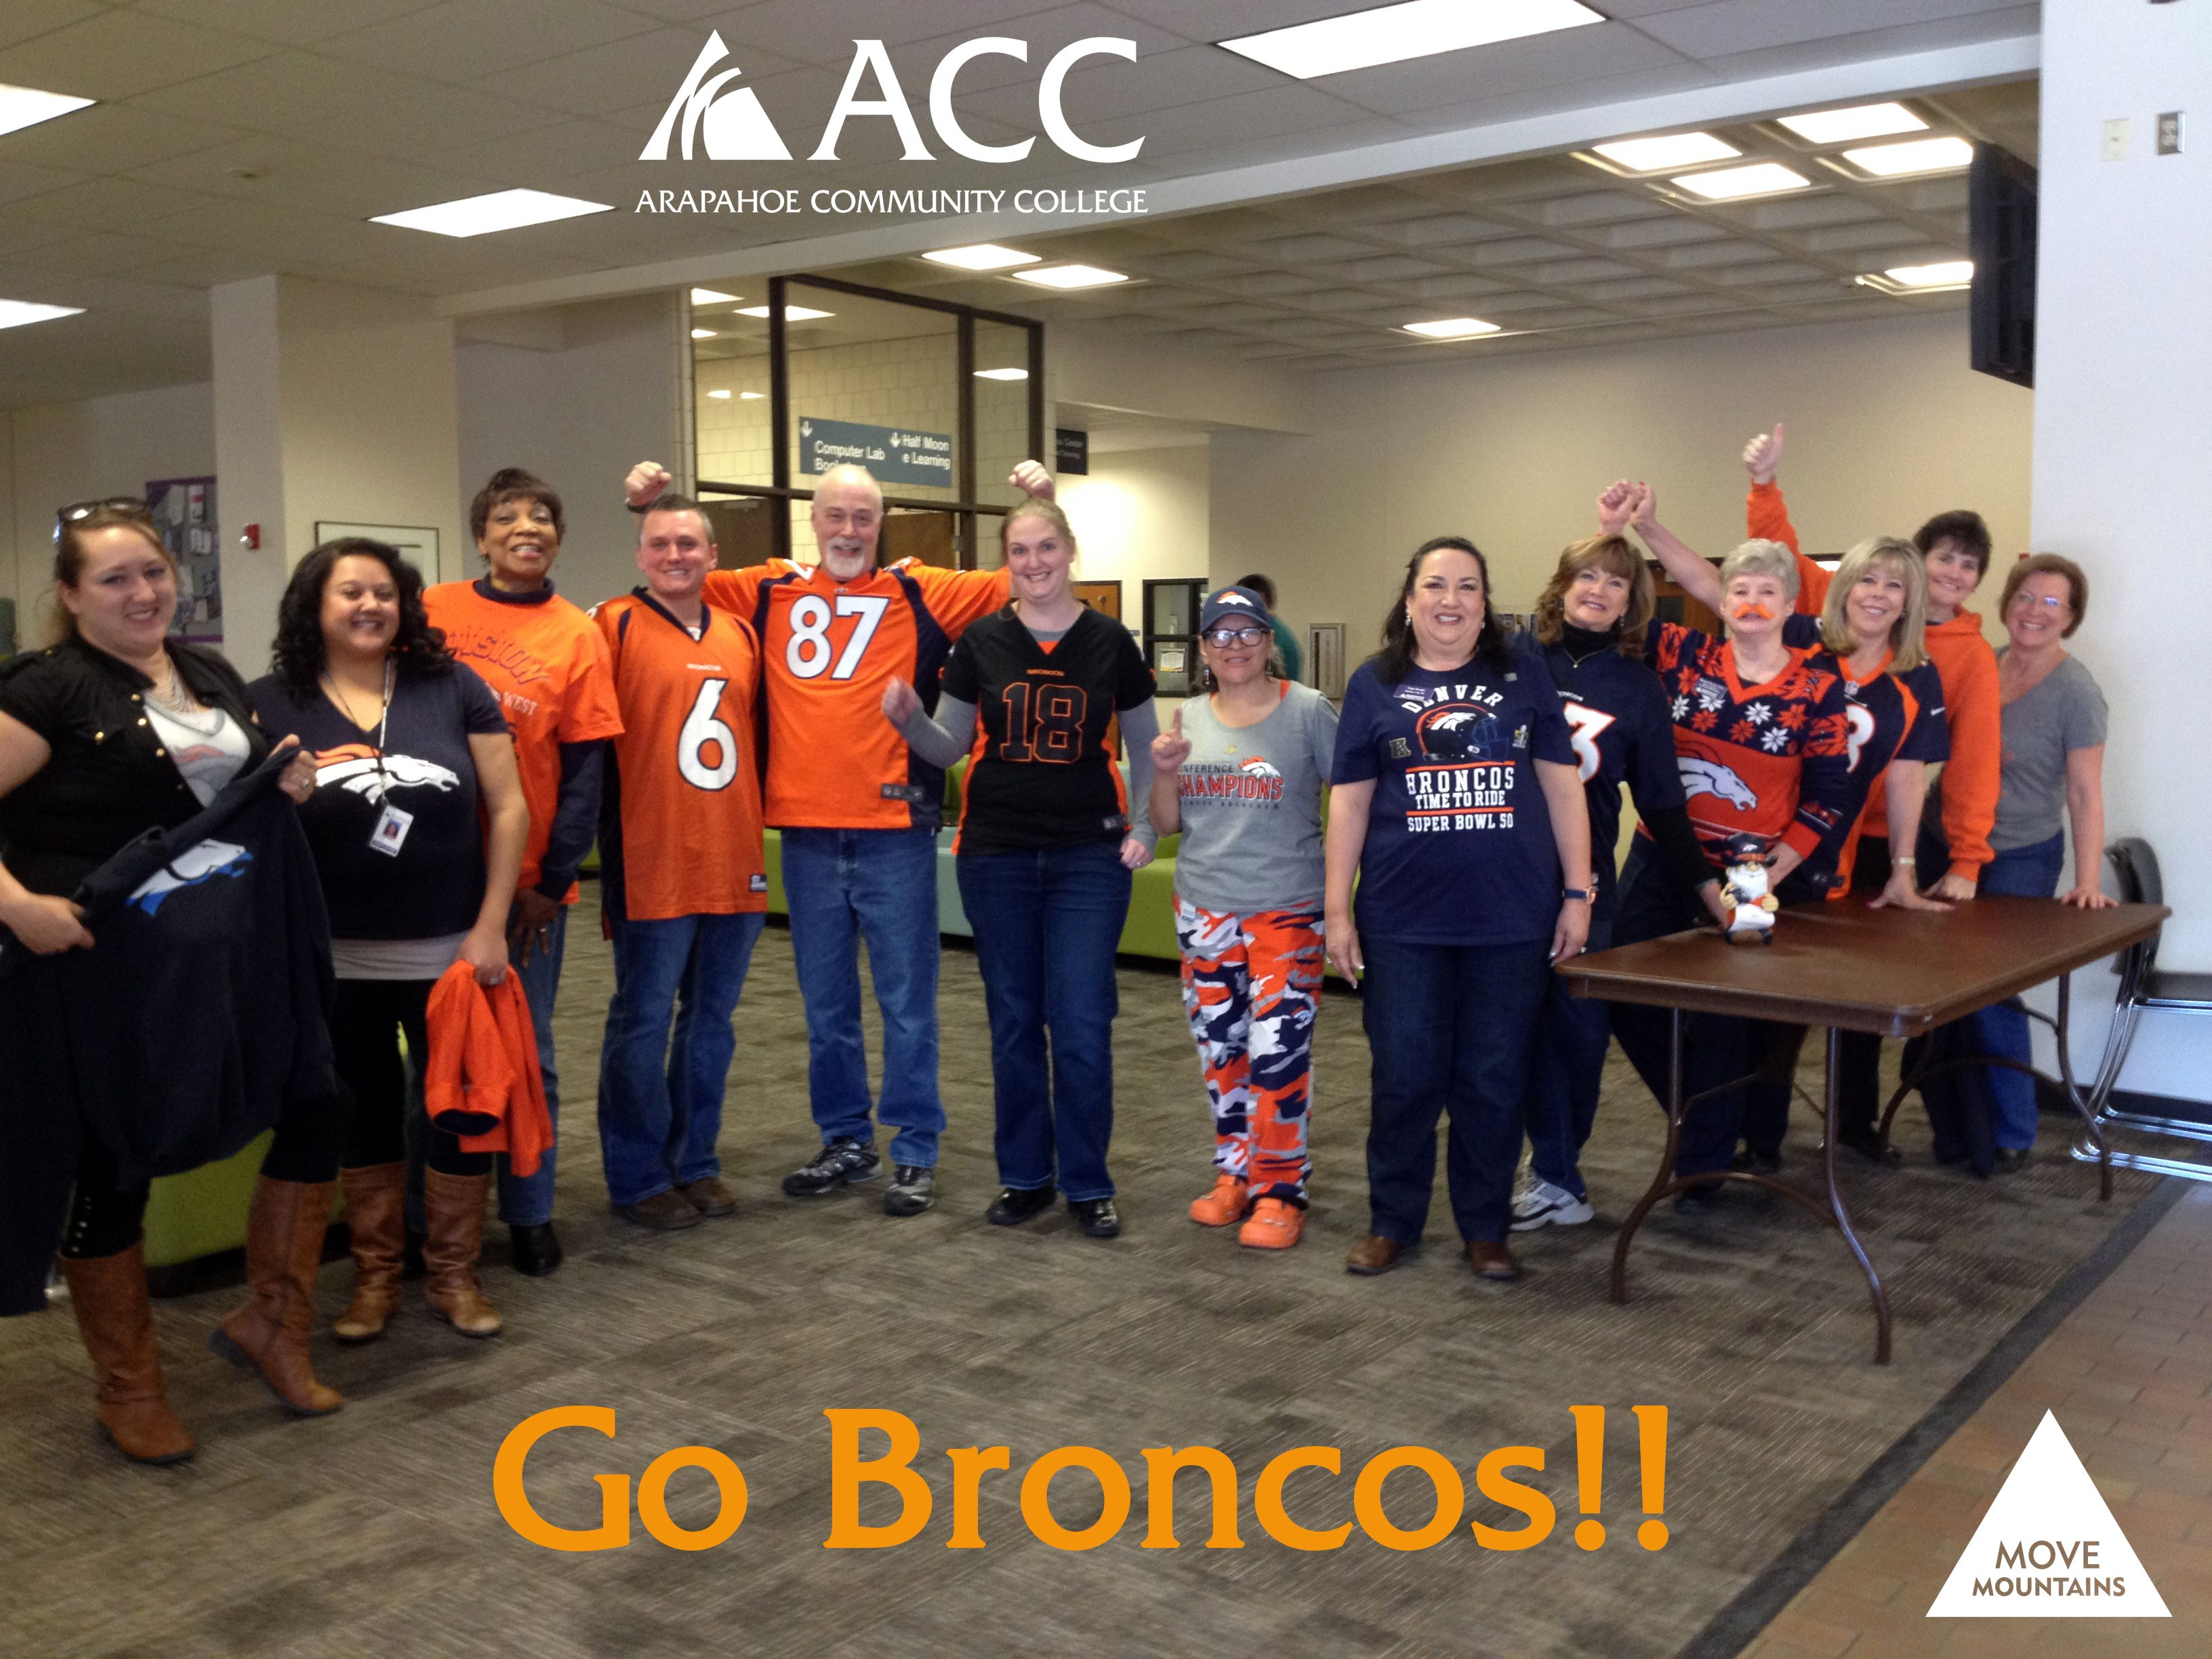 Broncos fans at #ArapahoeCC (Feb. 5, 2016).